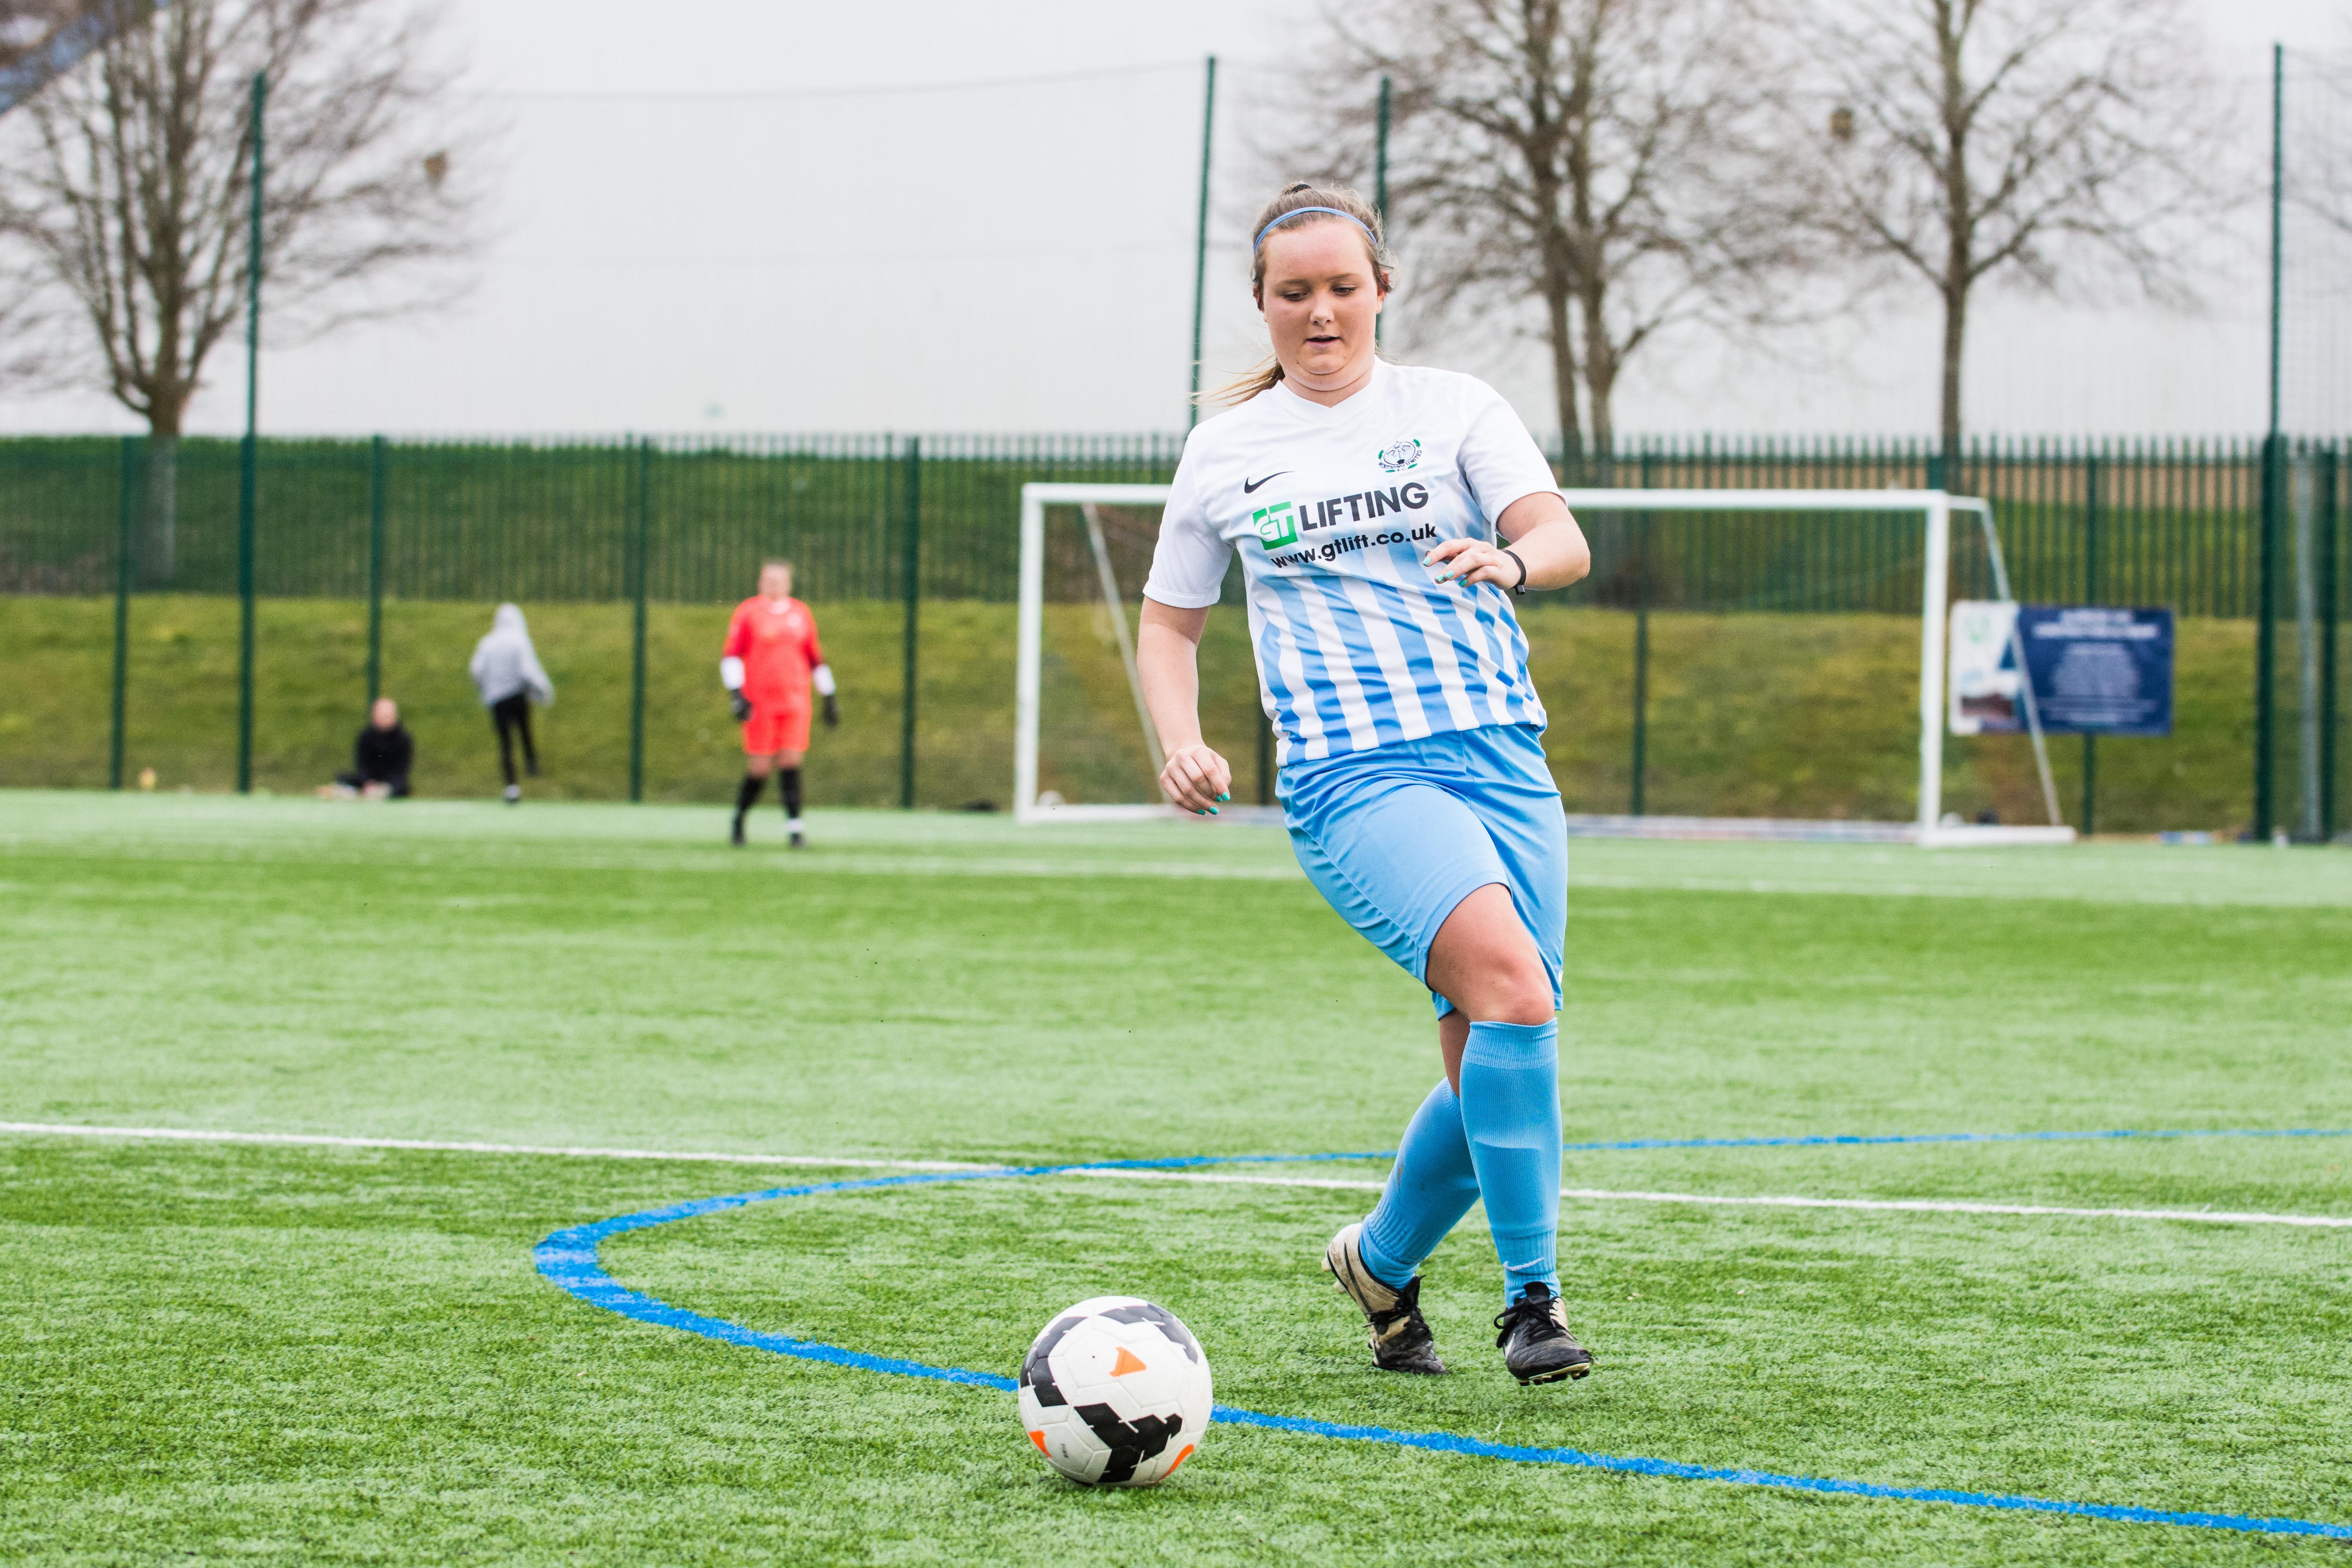 DAVID_JEFFERY Saltdean Utd Ladies FC vs Worthing Utd Ladies FC 11.03.18 57